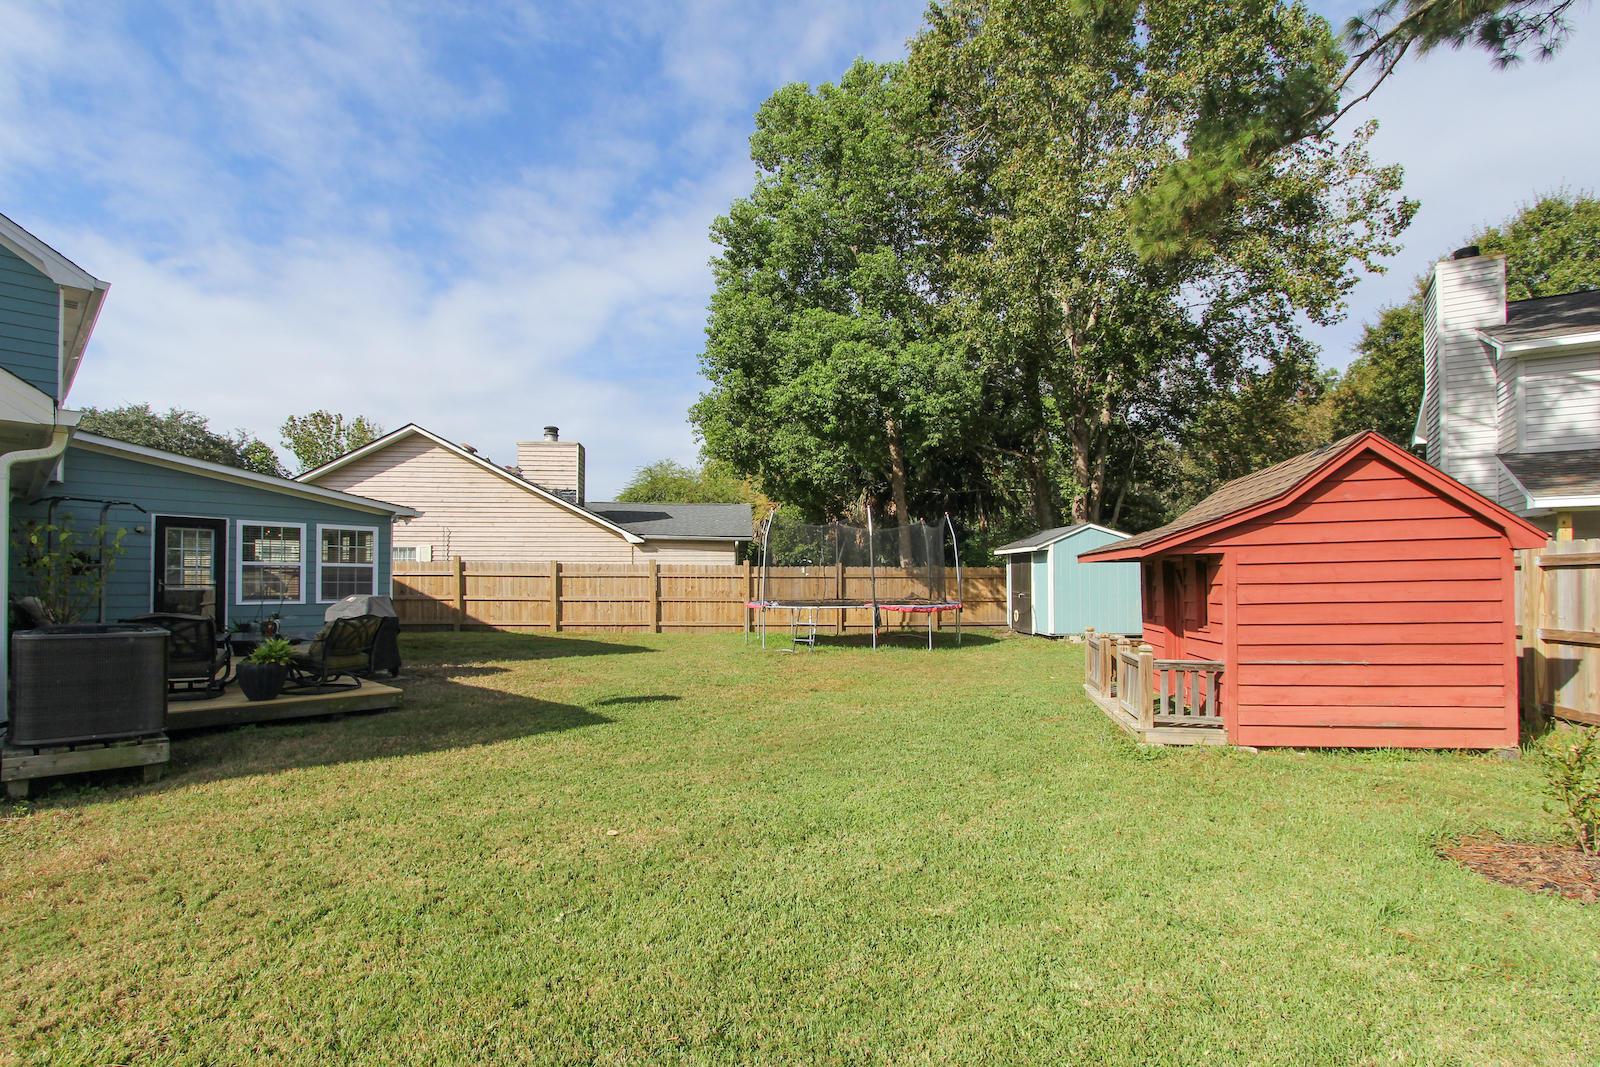 Landings Run Homes For Sale - 1548 Wickfield, Mount Pleasant, SC - 6